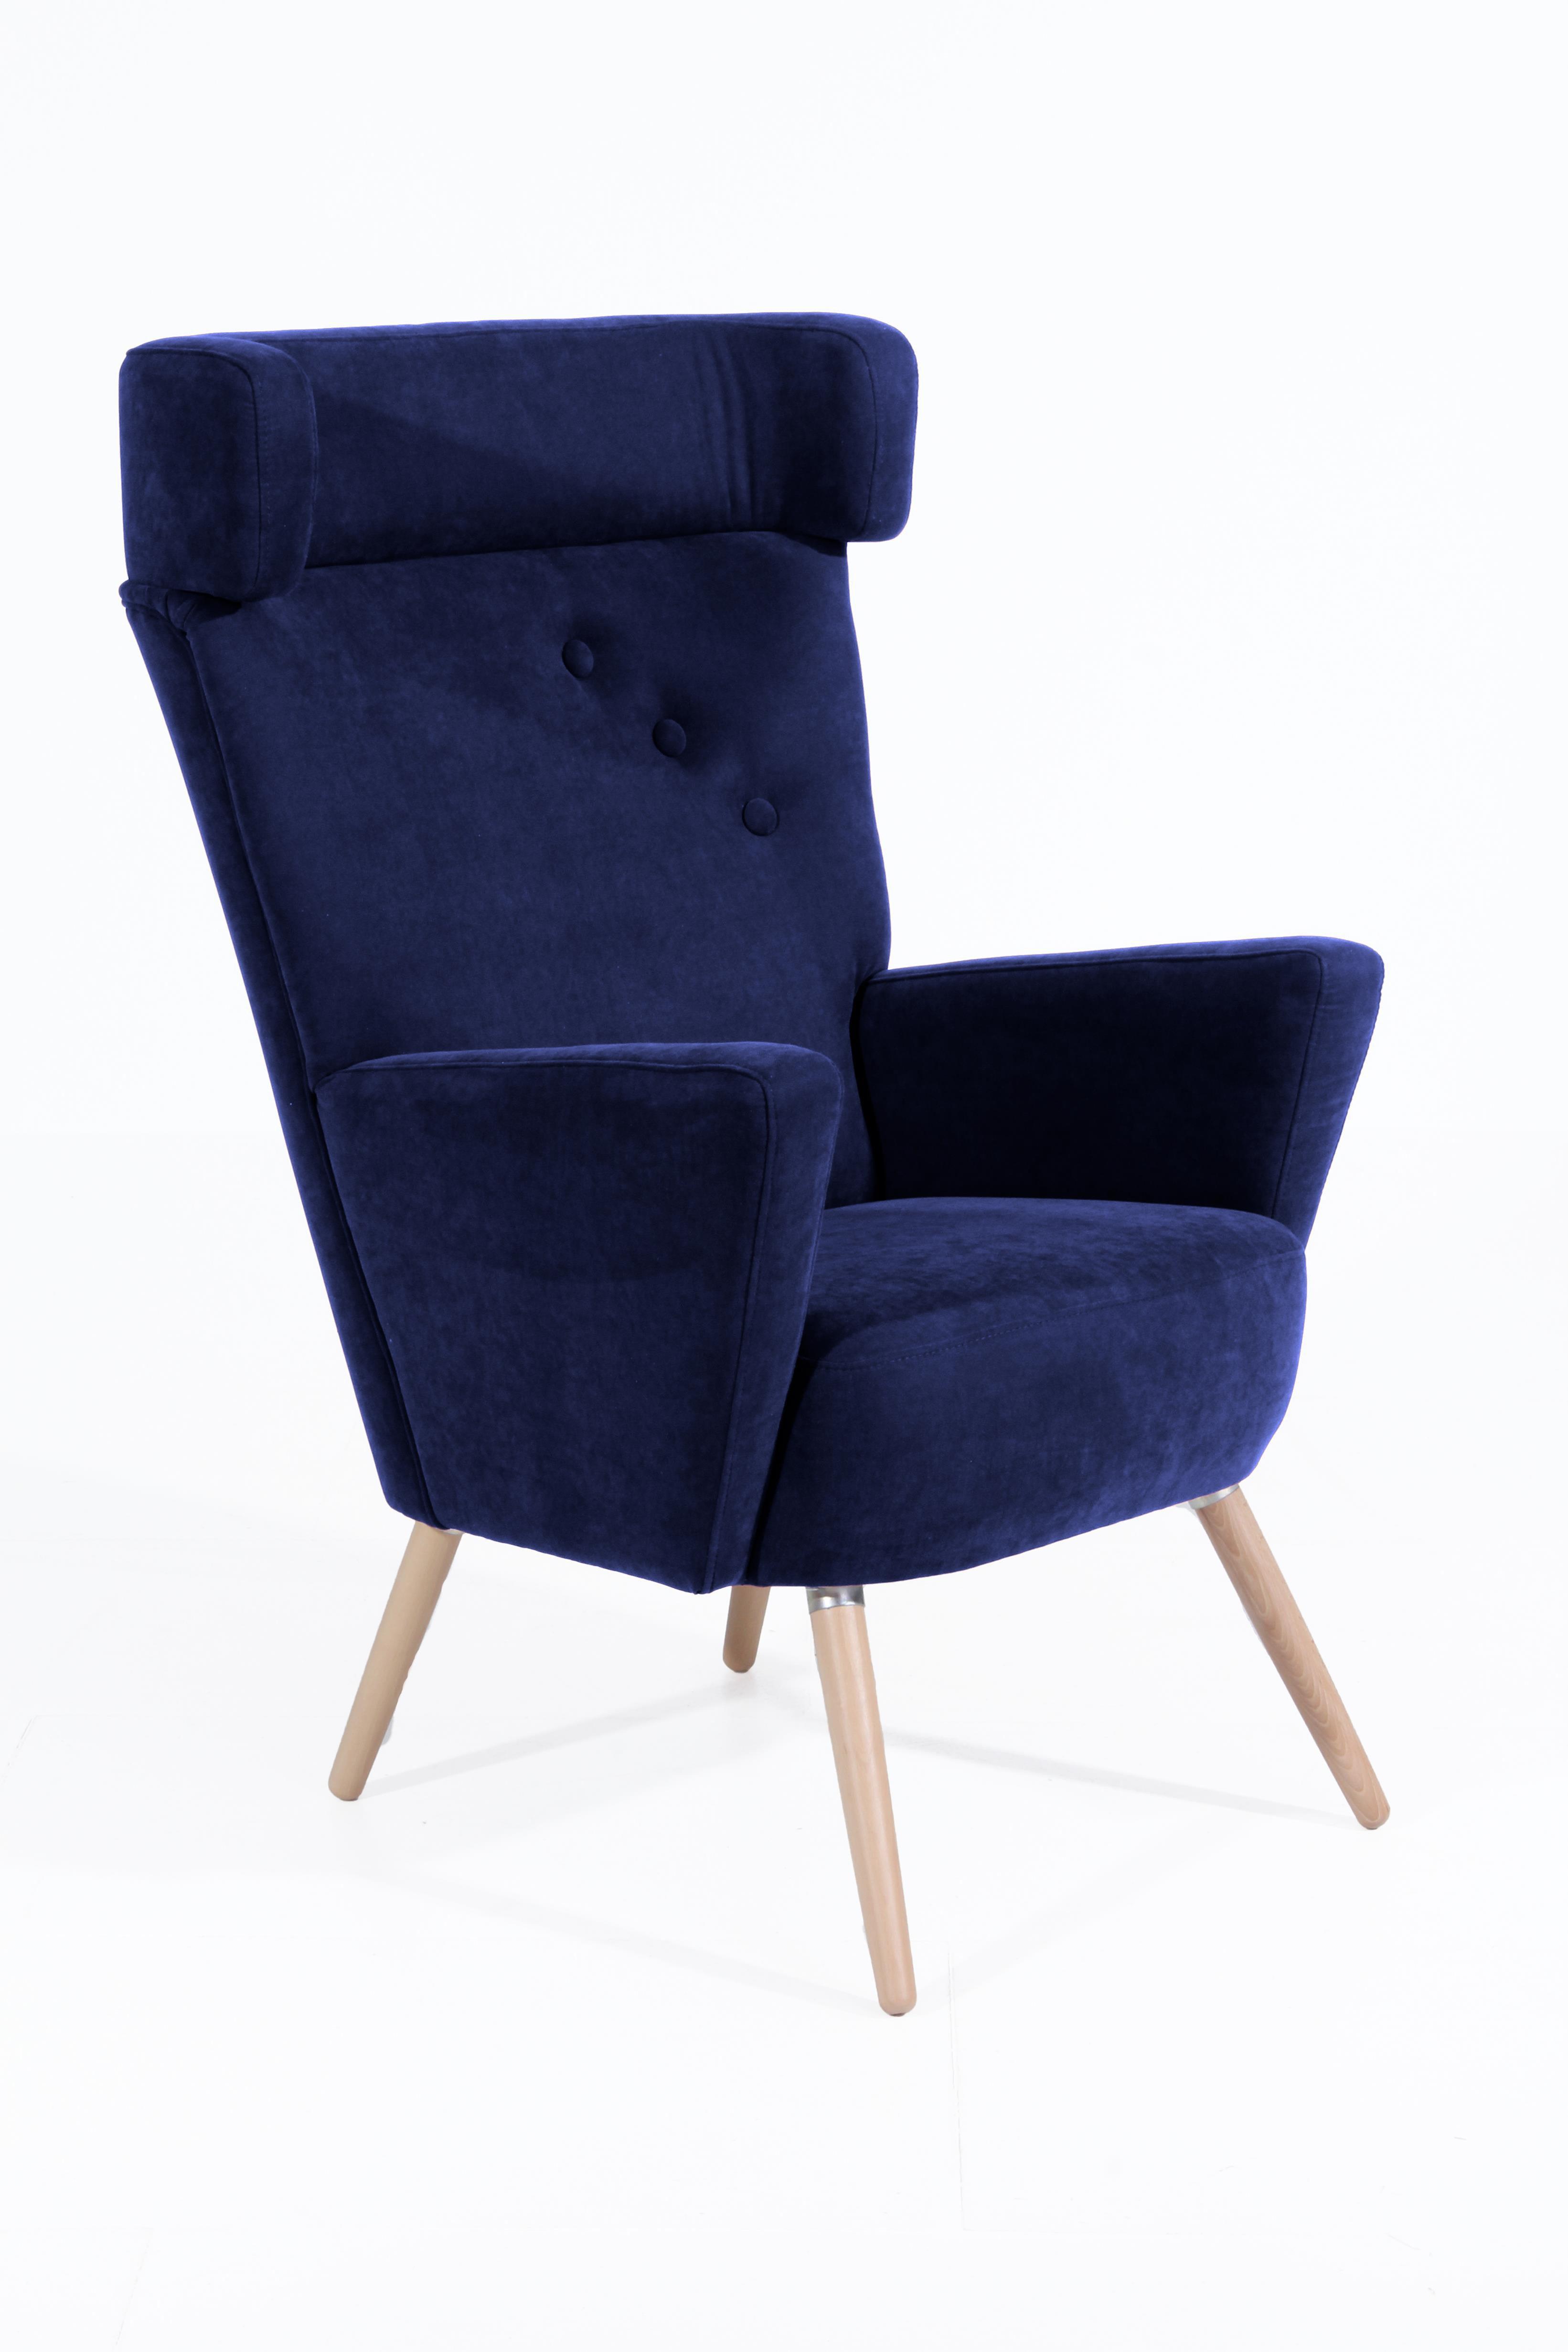 max winzer hajo ohrensessel in blau m bel letz ihr online shop. Black Bedroom Furniture Sets. Home Design Ideas